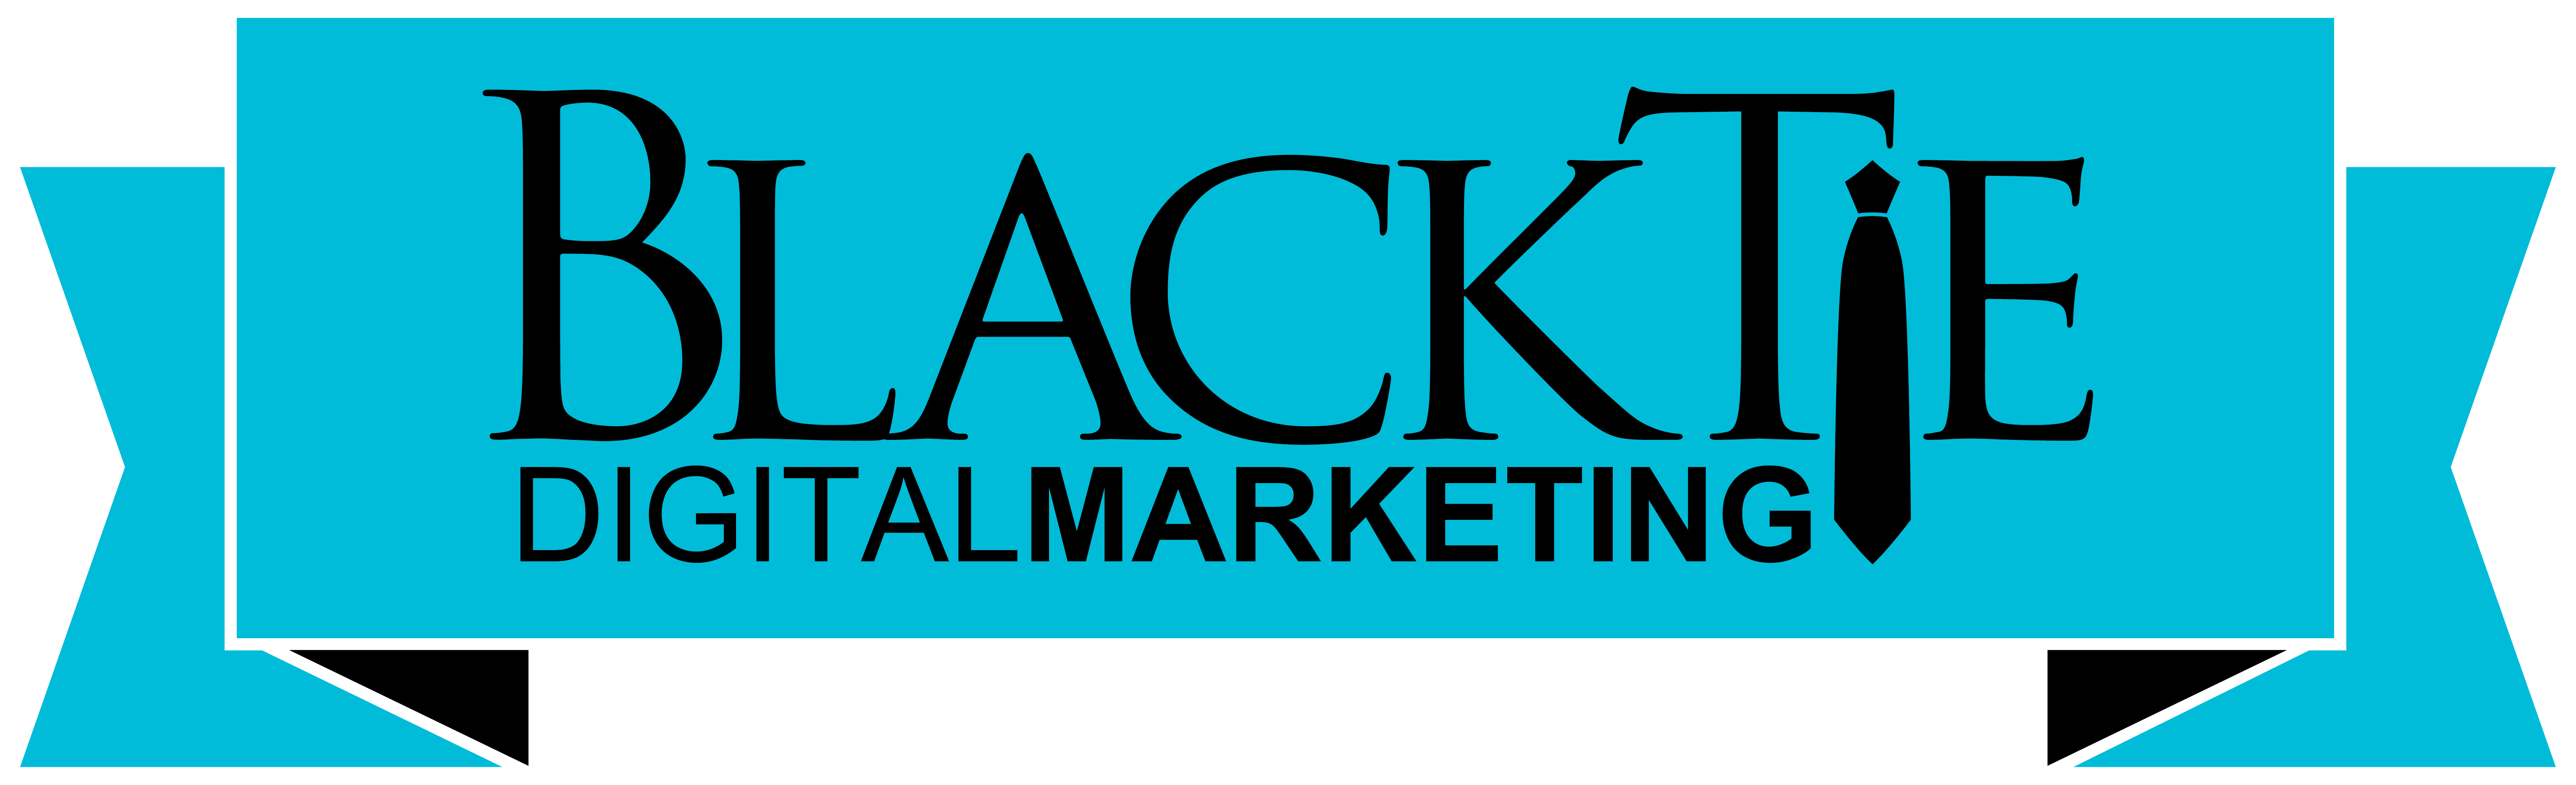 Black Tie Digital Marketing